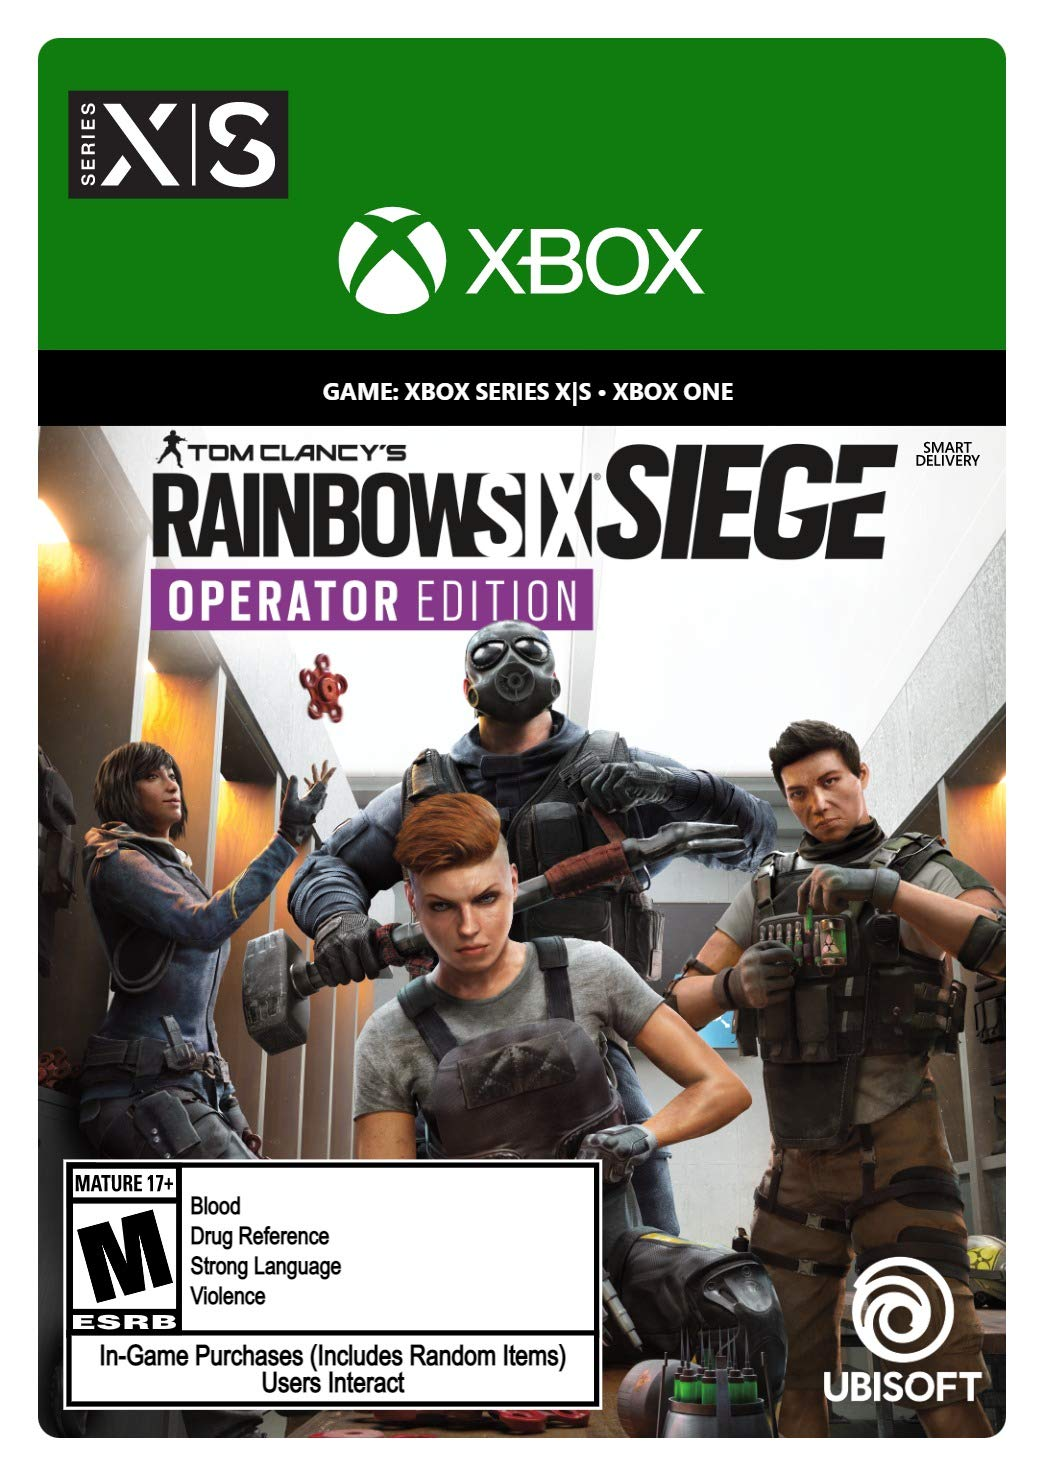 Tom Clancy's Cheap bargain Rainbow Six Siege Operator Xbox Soldering Series X Edition -